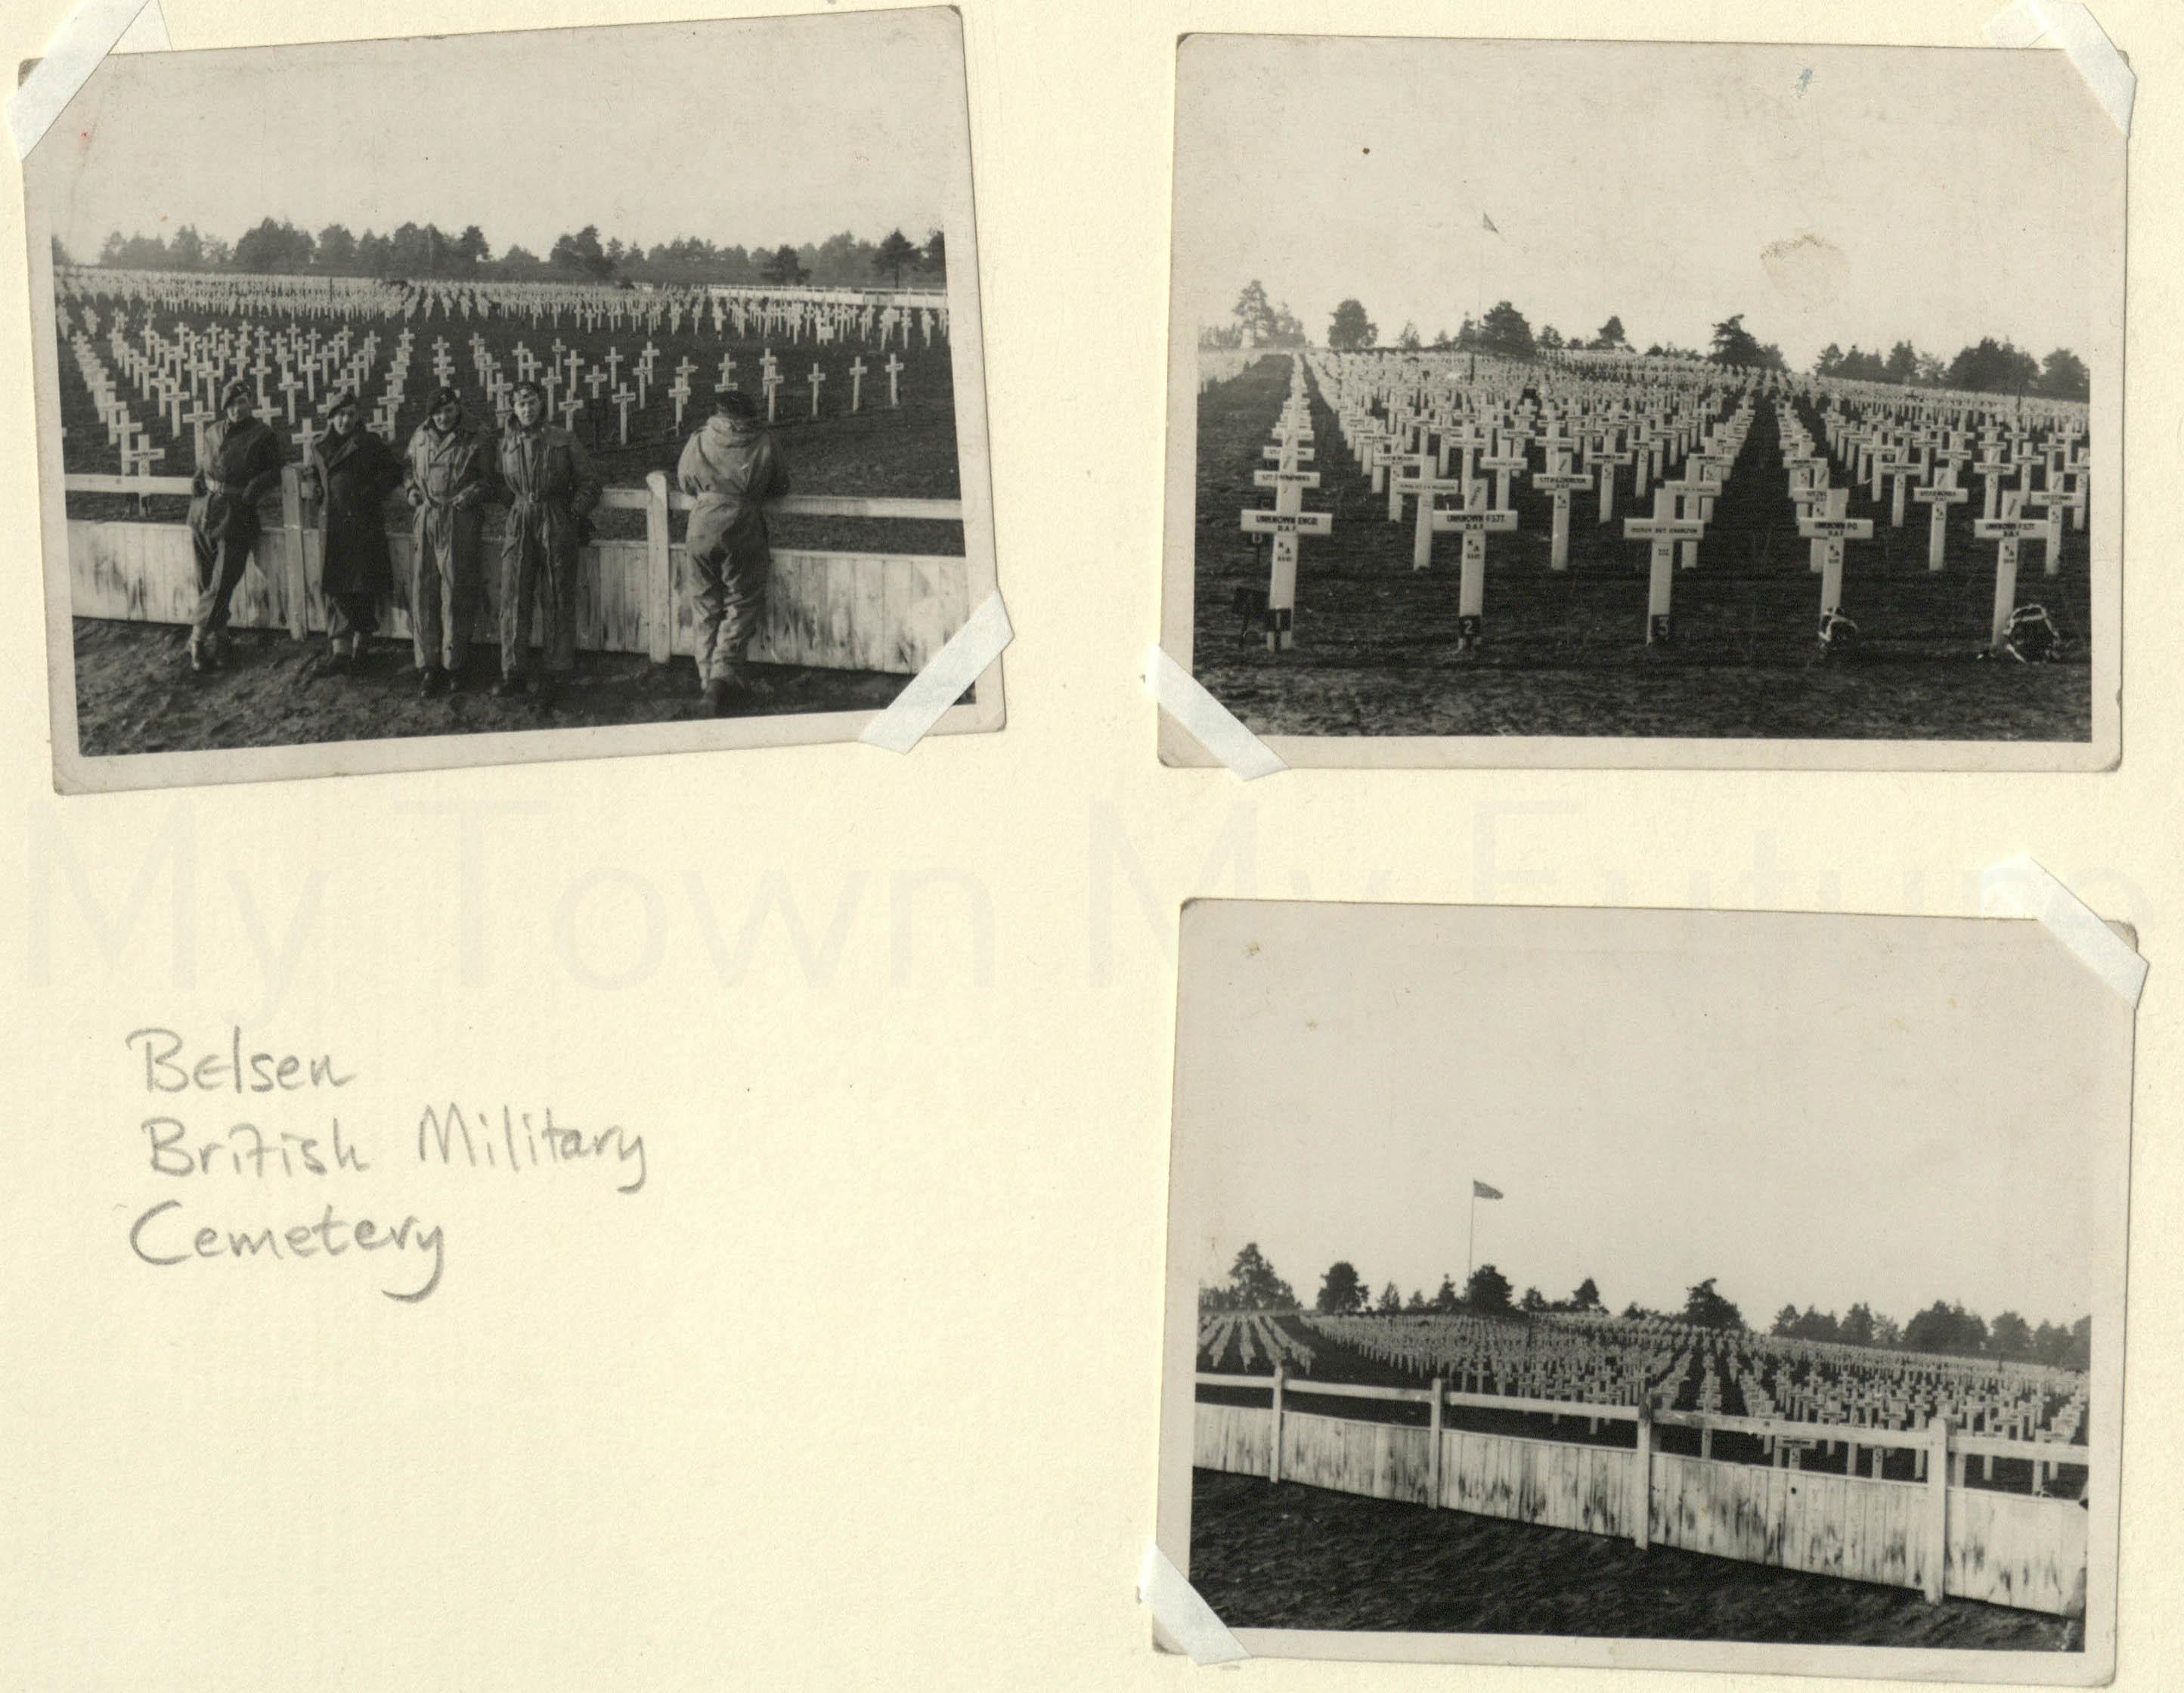 Belsen British Military Cemetery